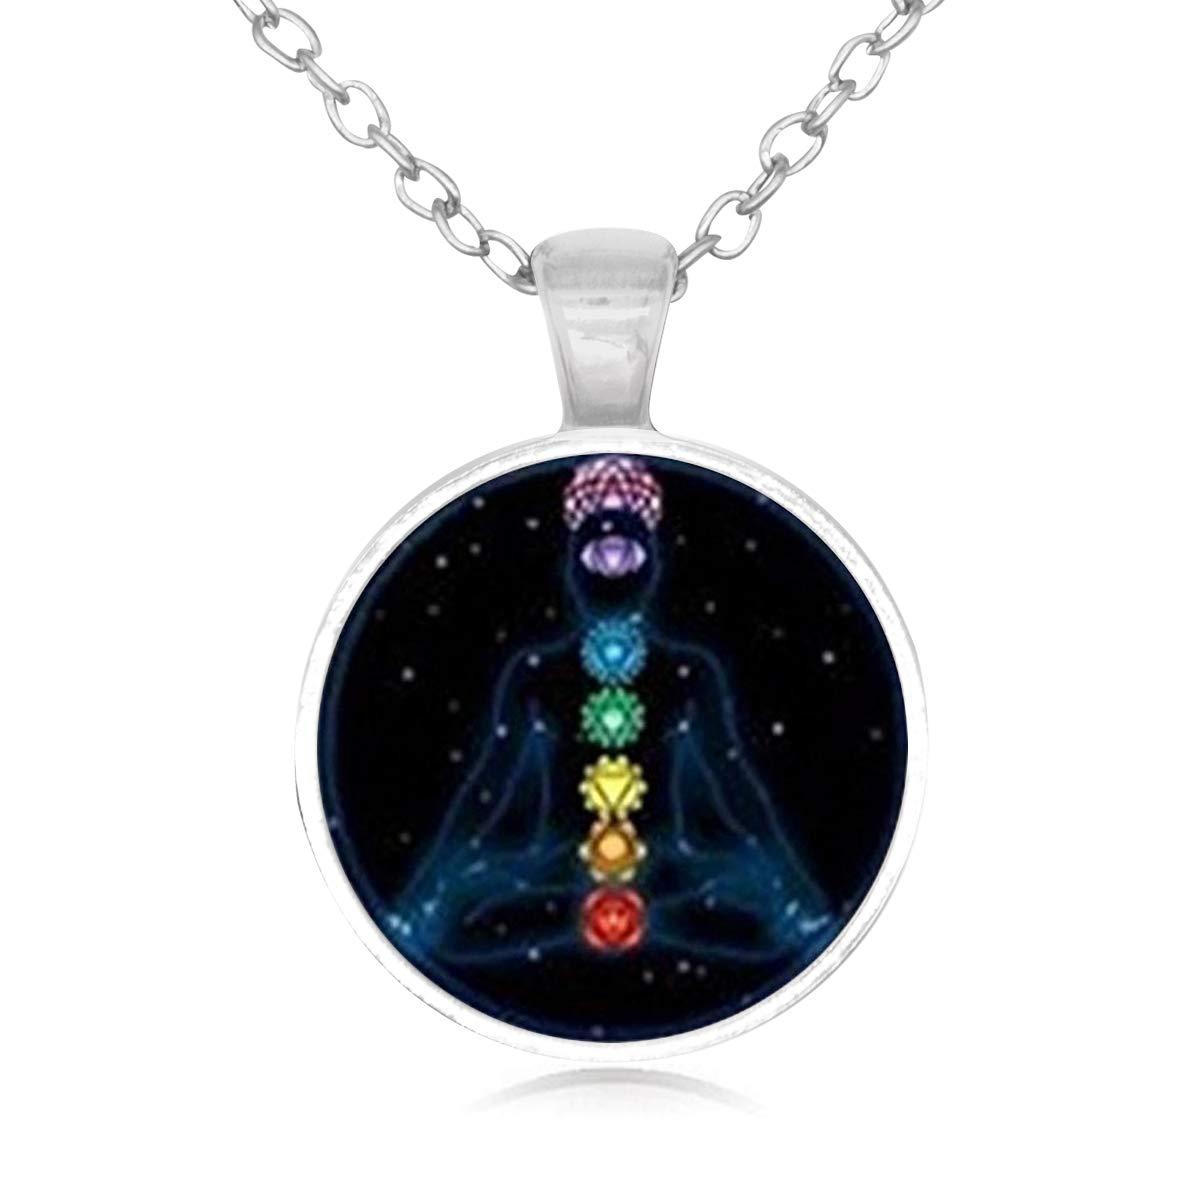 Lightrain Reiki Chakra Healing Yoga Pendant Necklace Vintage Bronze Chain Statement Necklace Handmade Jewelry Gifts